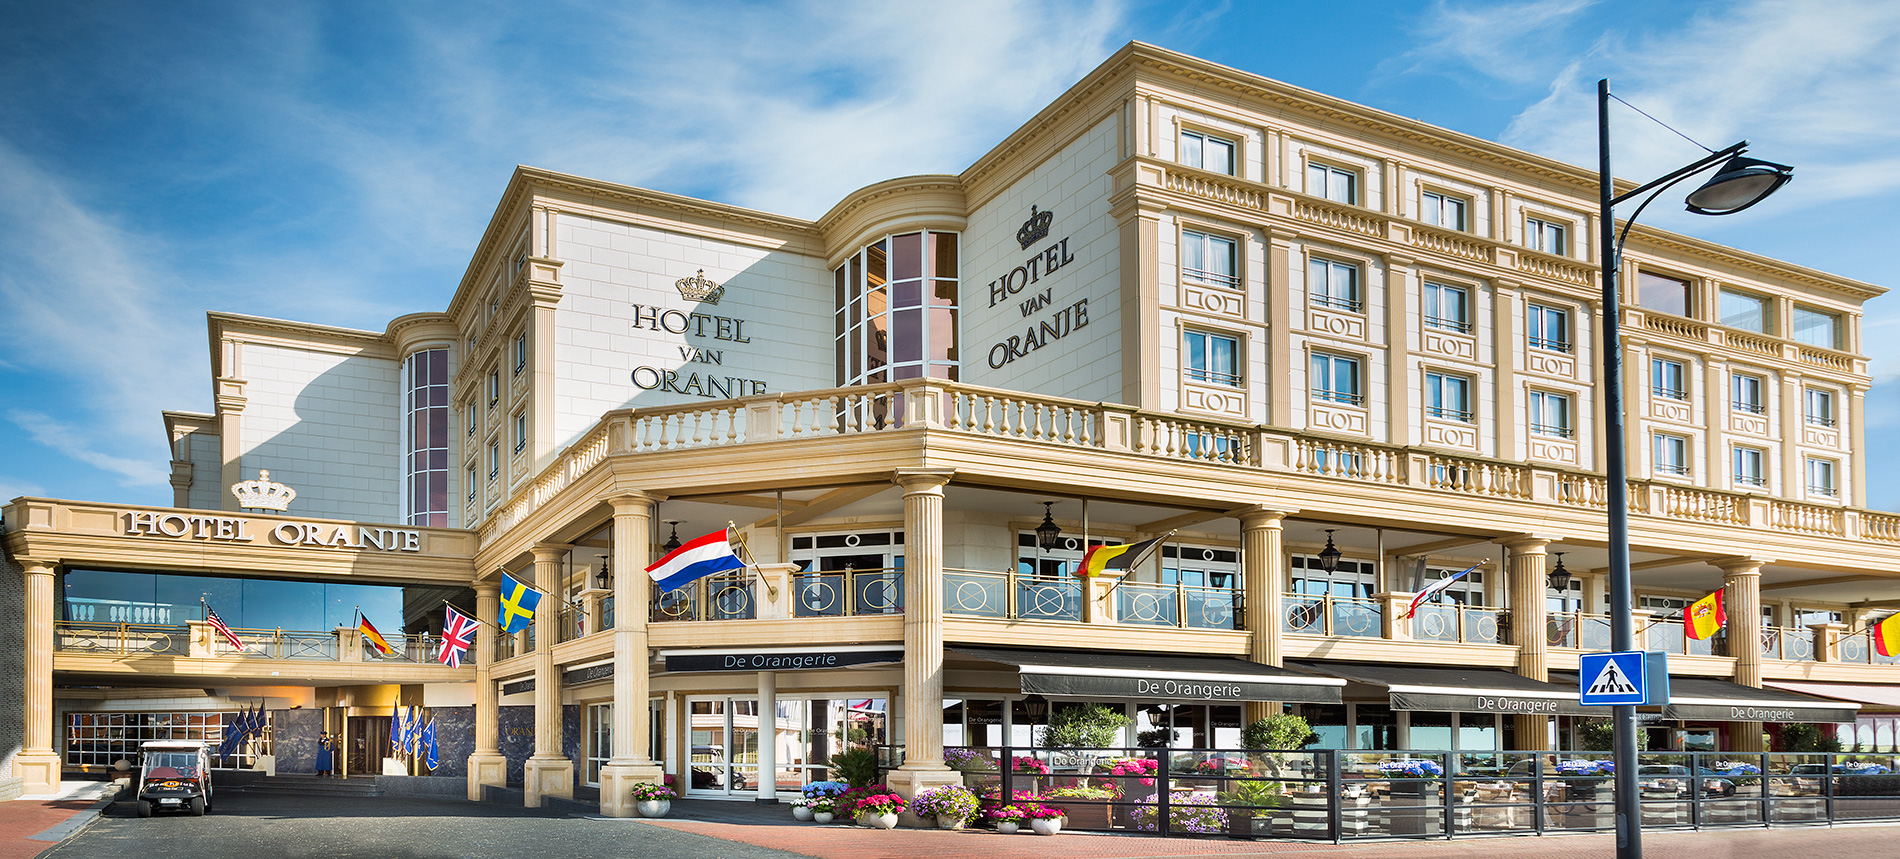 Autograph Collection Adds Netherlands Based Hotel Van Oranje To Portfolio